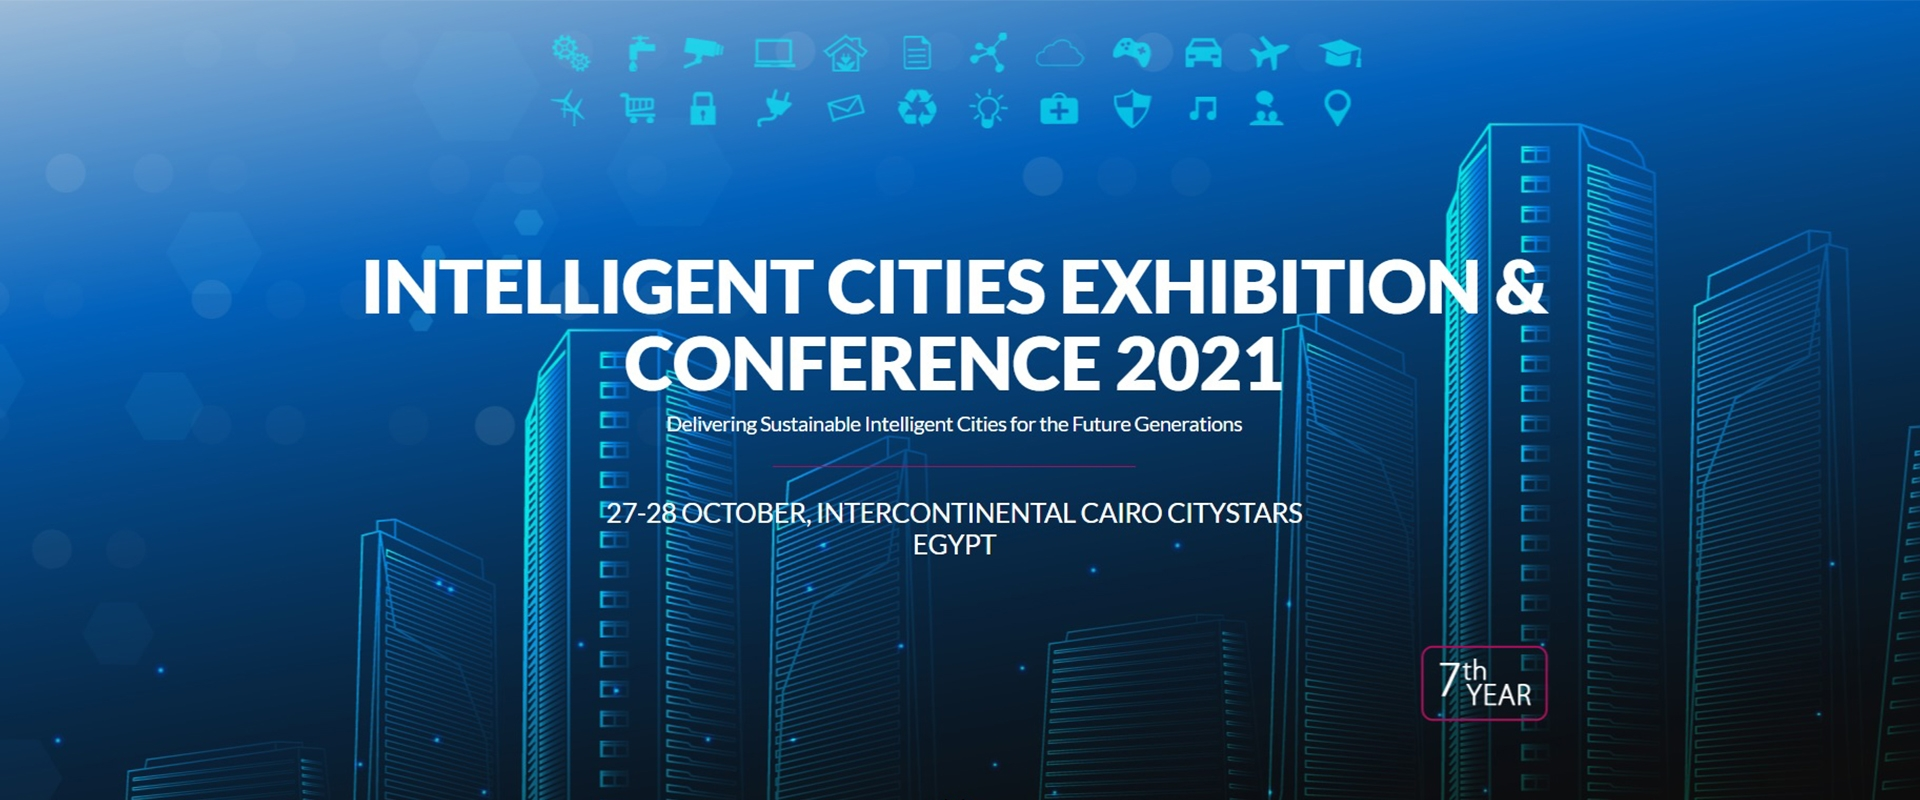 Intelligent Cities Exhibition & Conference 2021 - 27-28 ottobre - Egitto